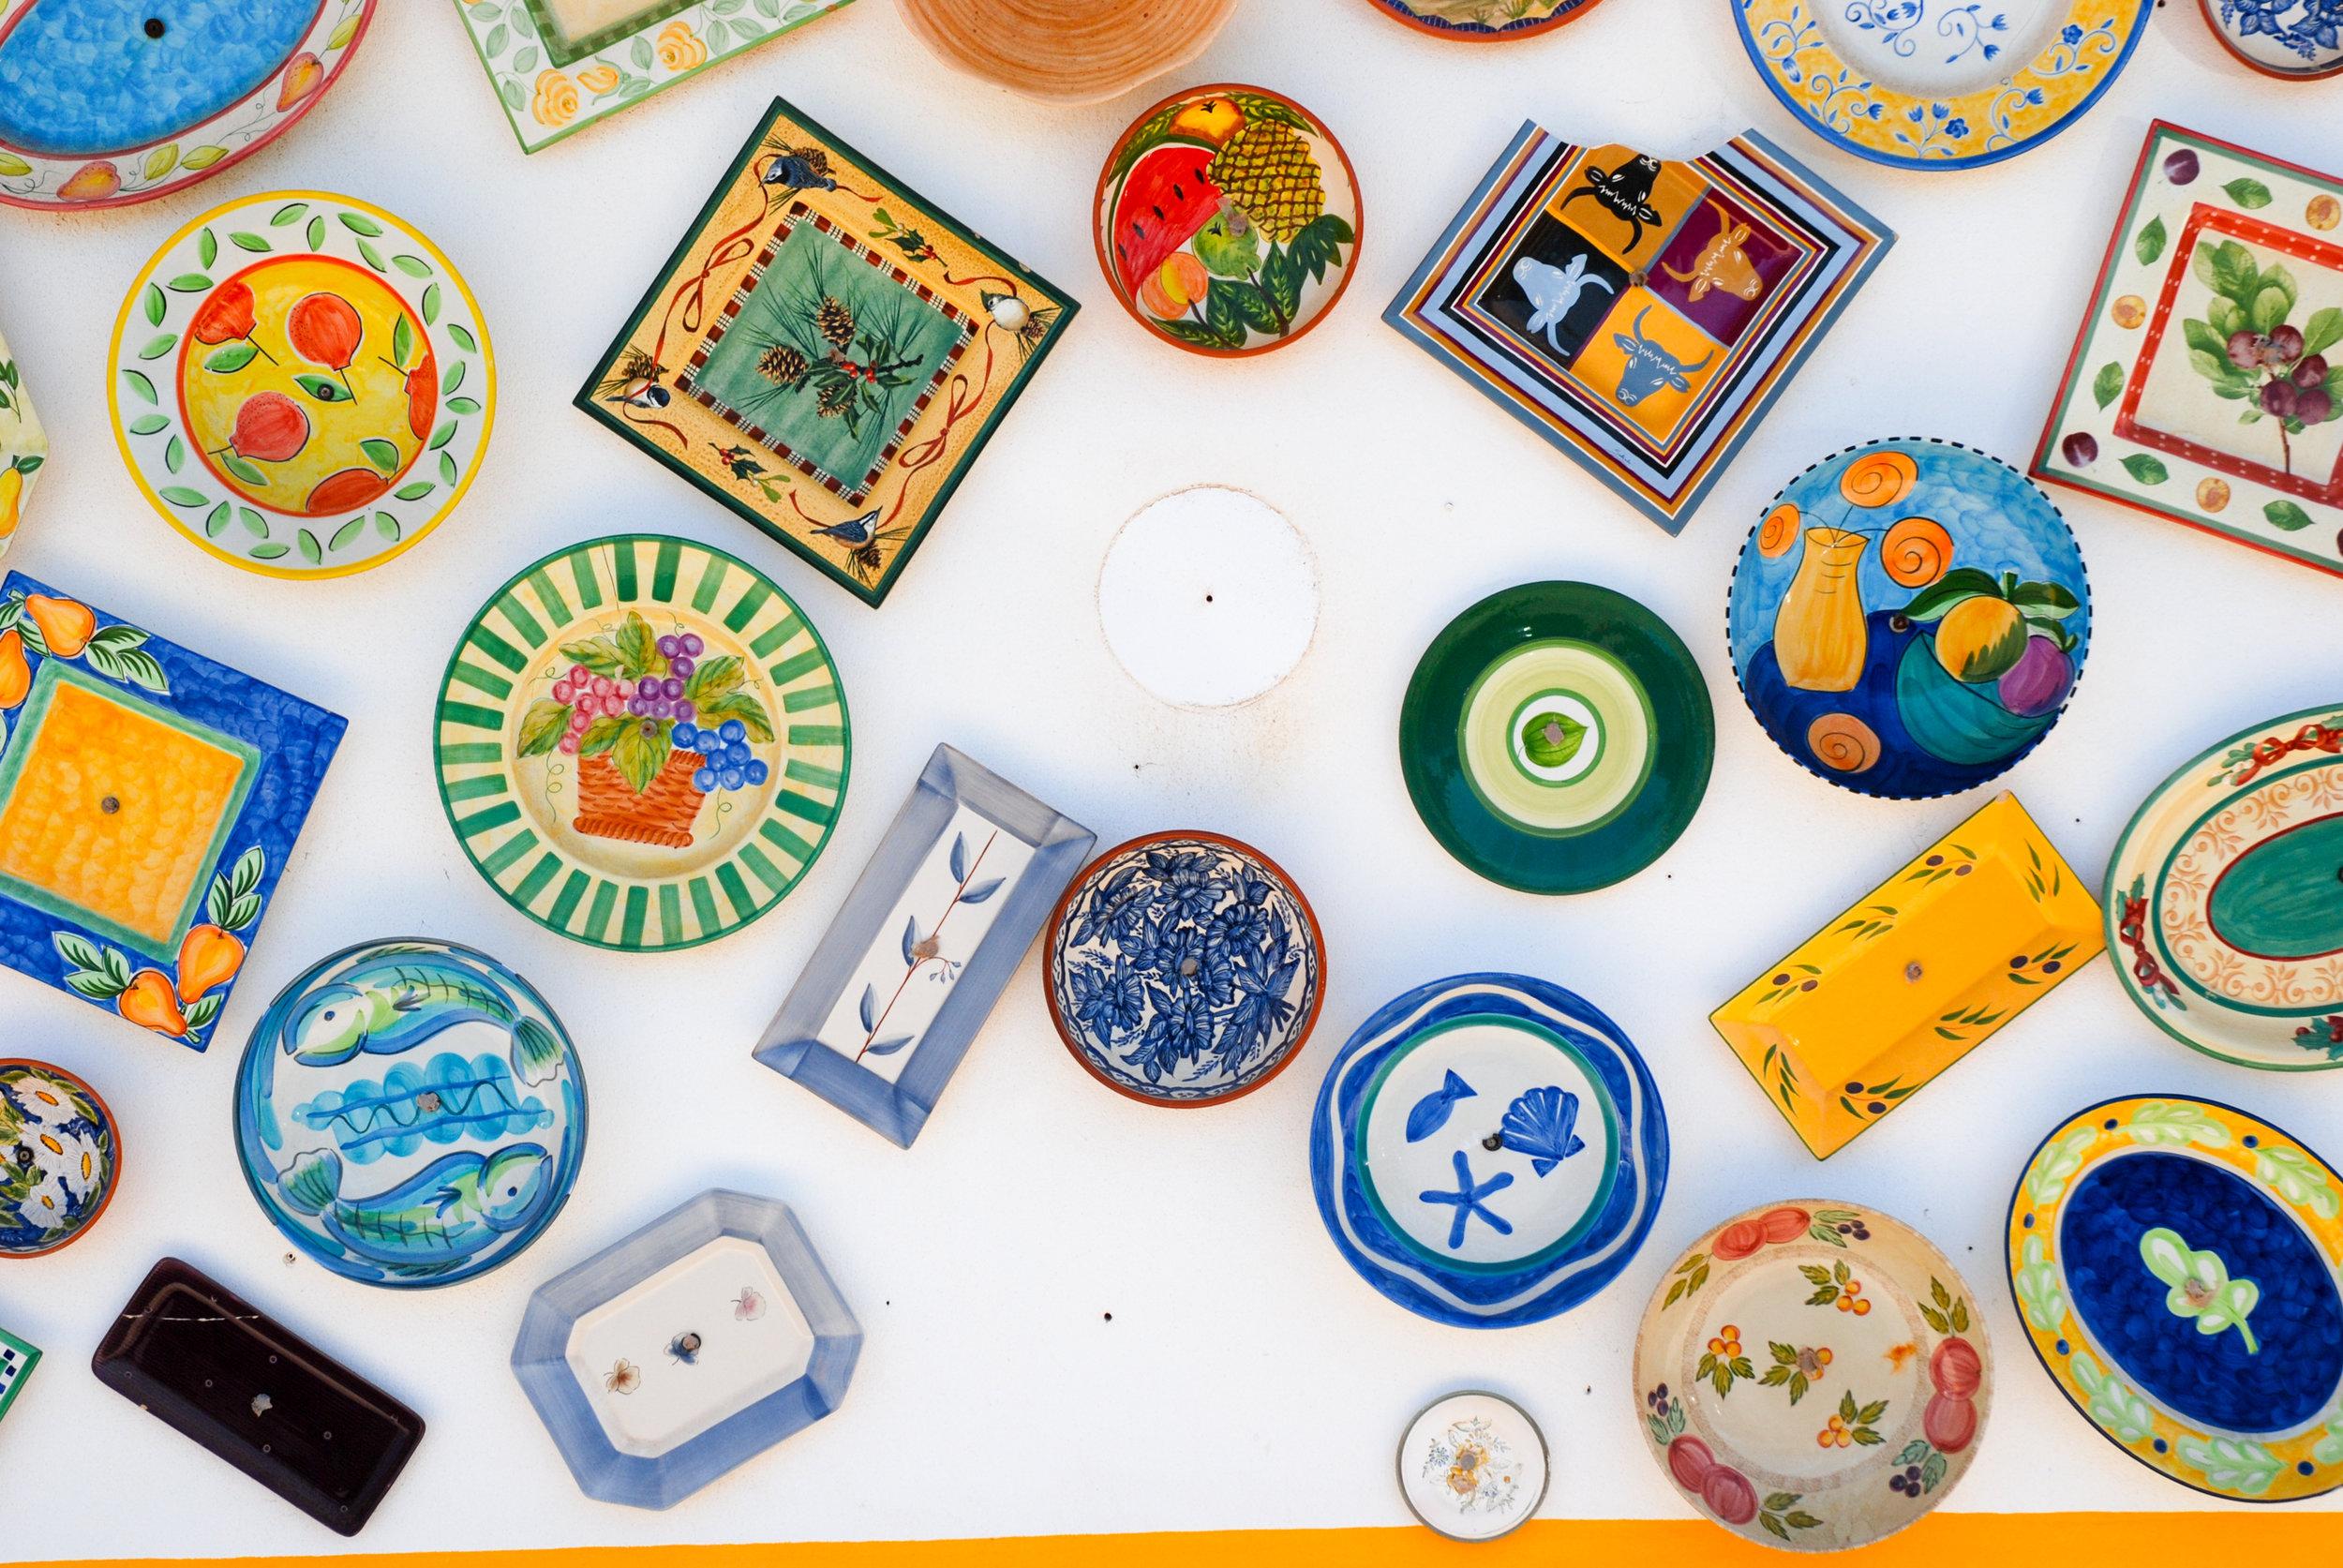 Travel - Portugal - Plates.jpg